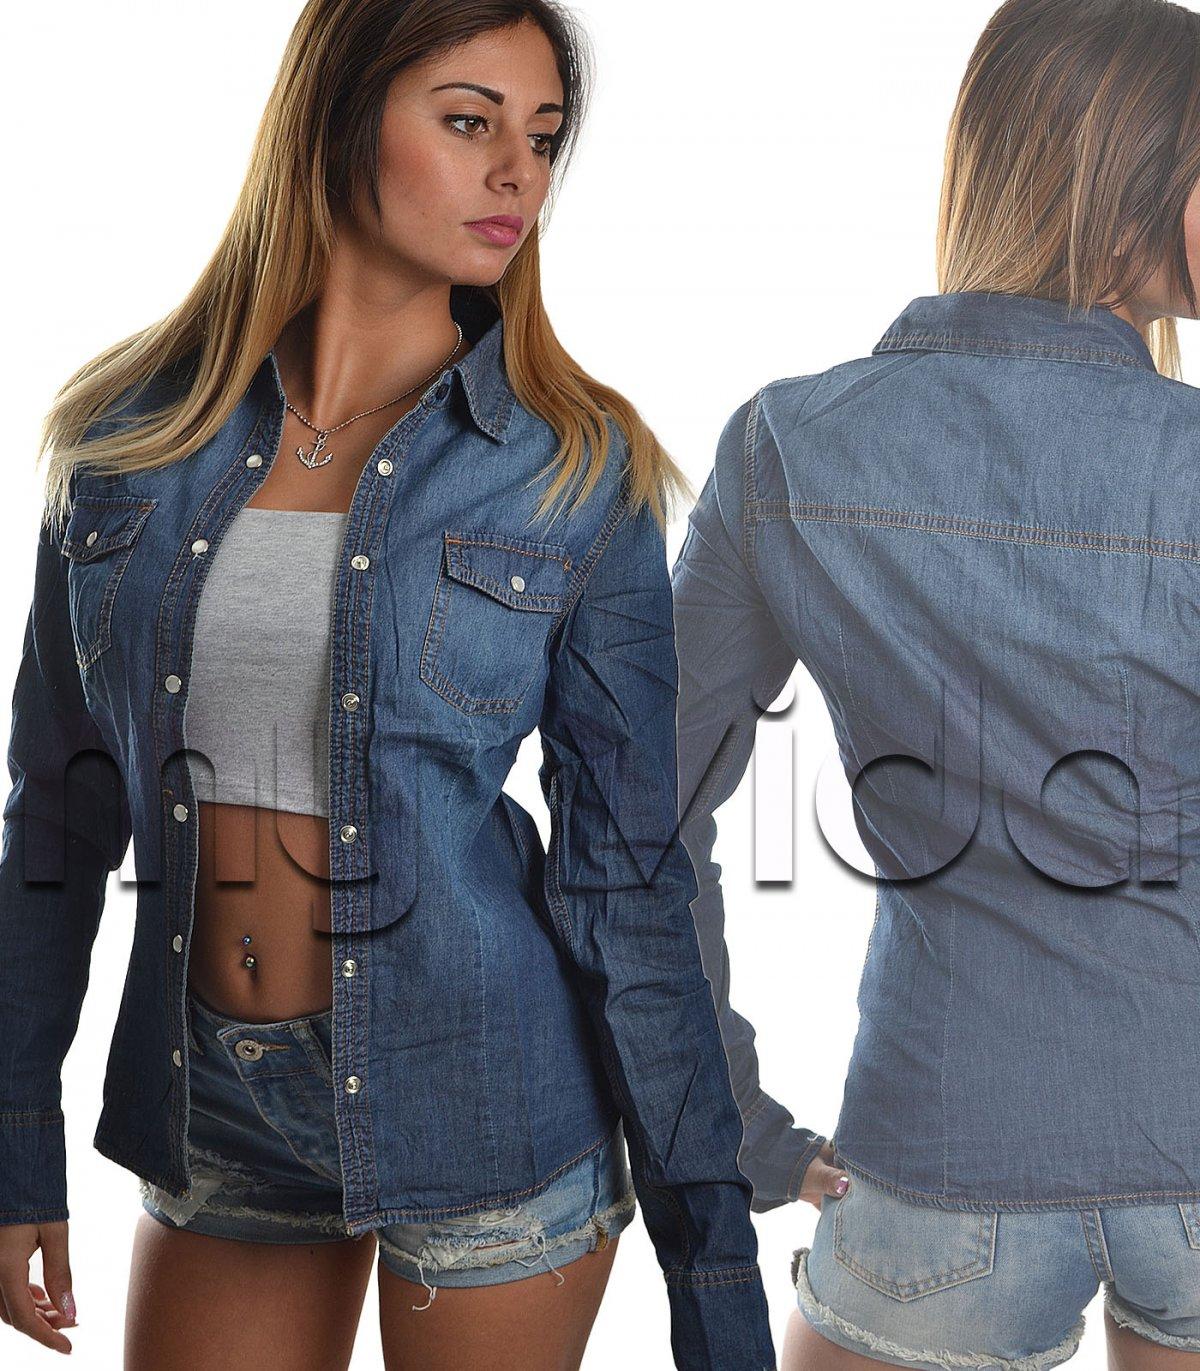 arrives 6b4ce 4acd4 Camicia jeans donna denim giacca casual | My Vida